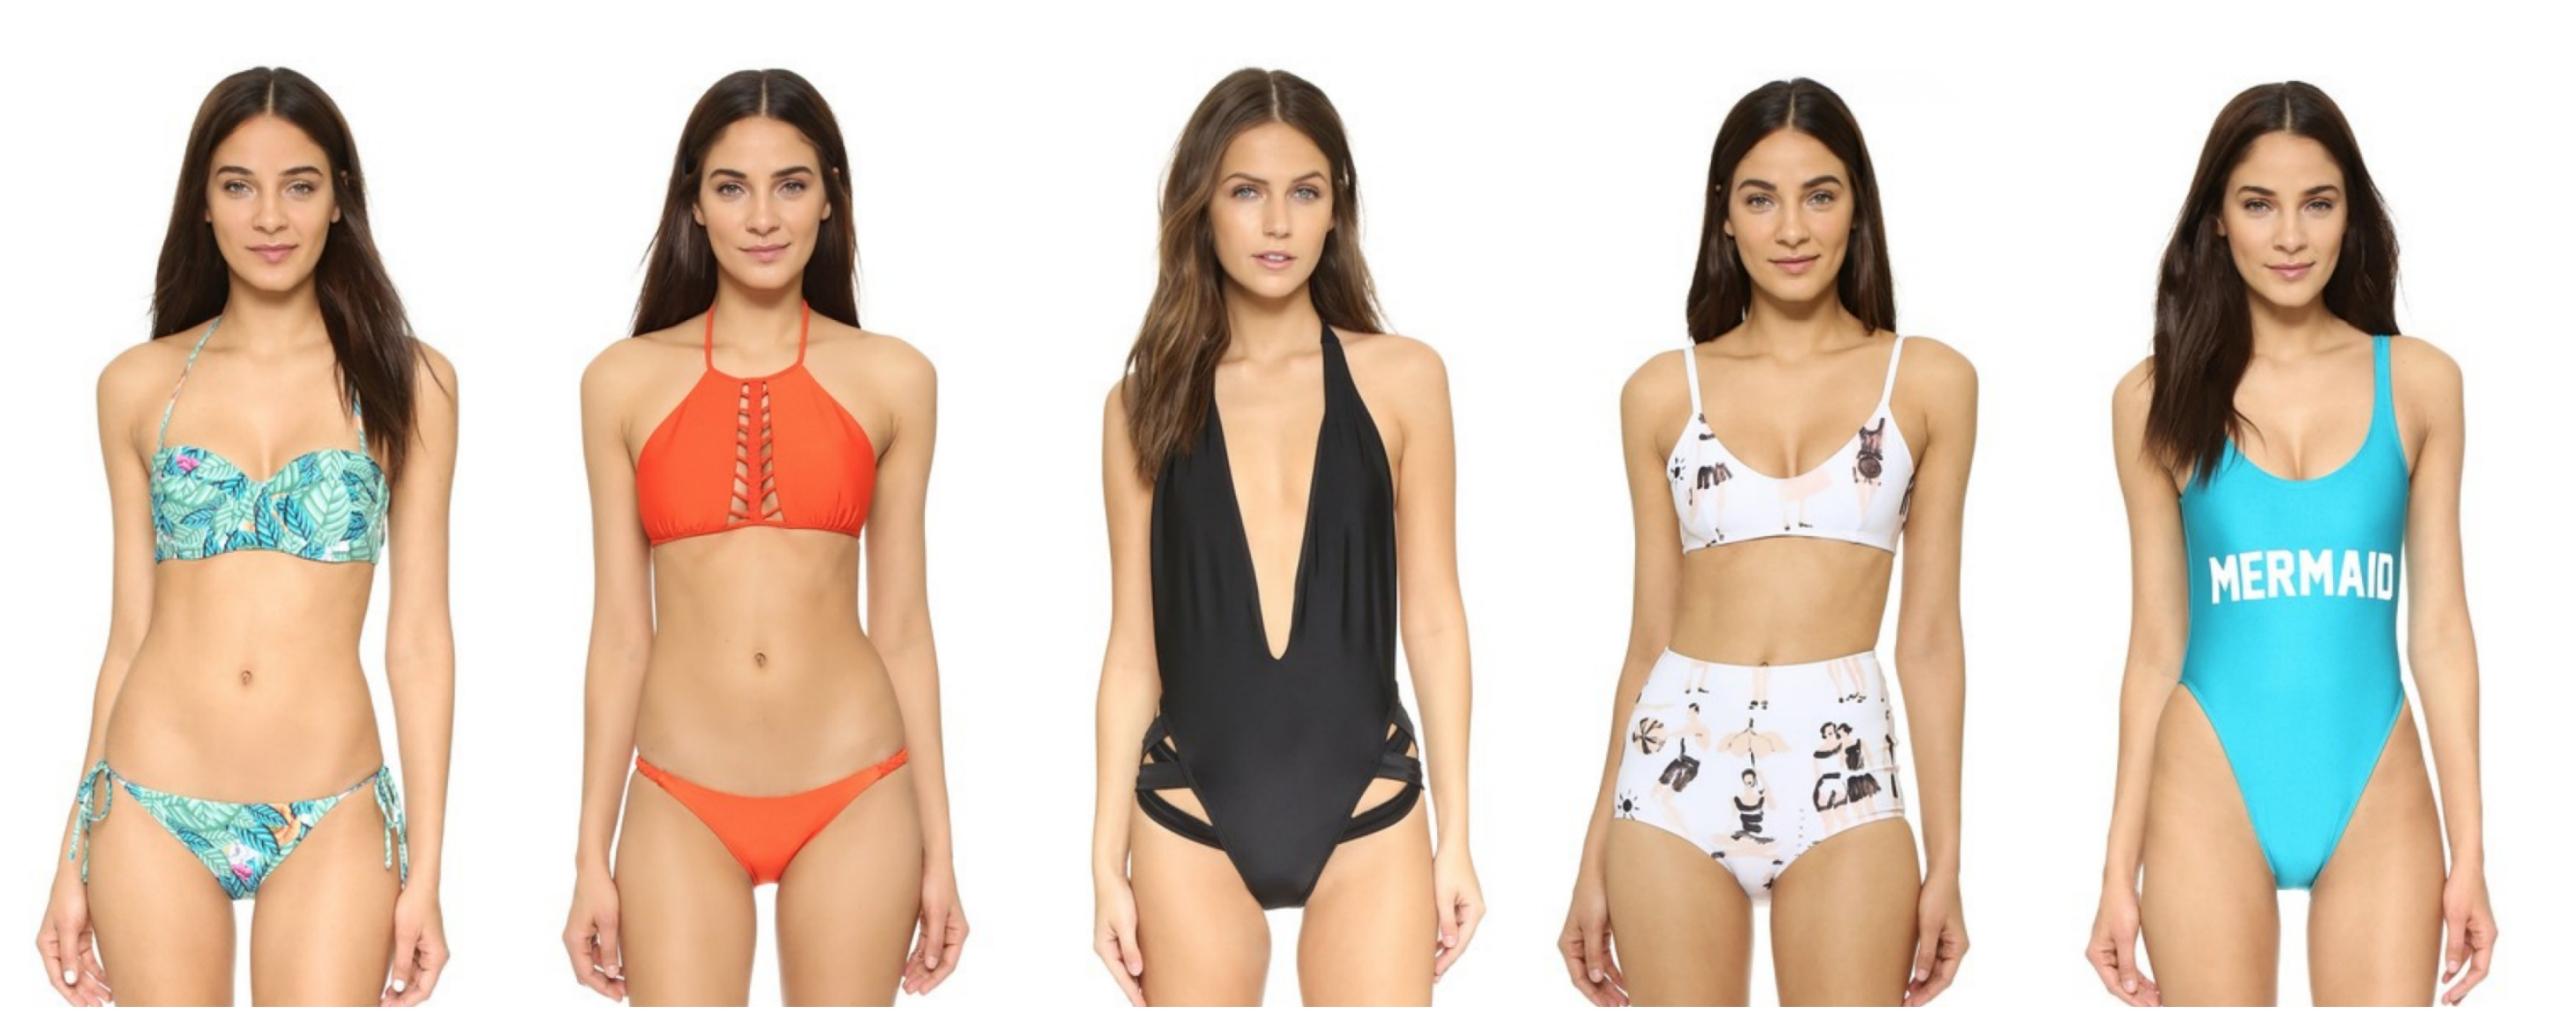 bikini_shopbop1